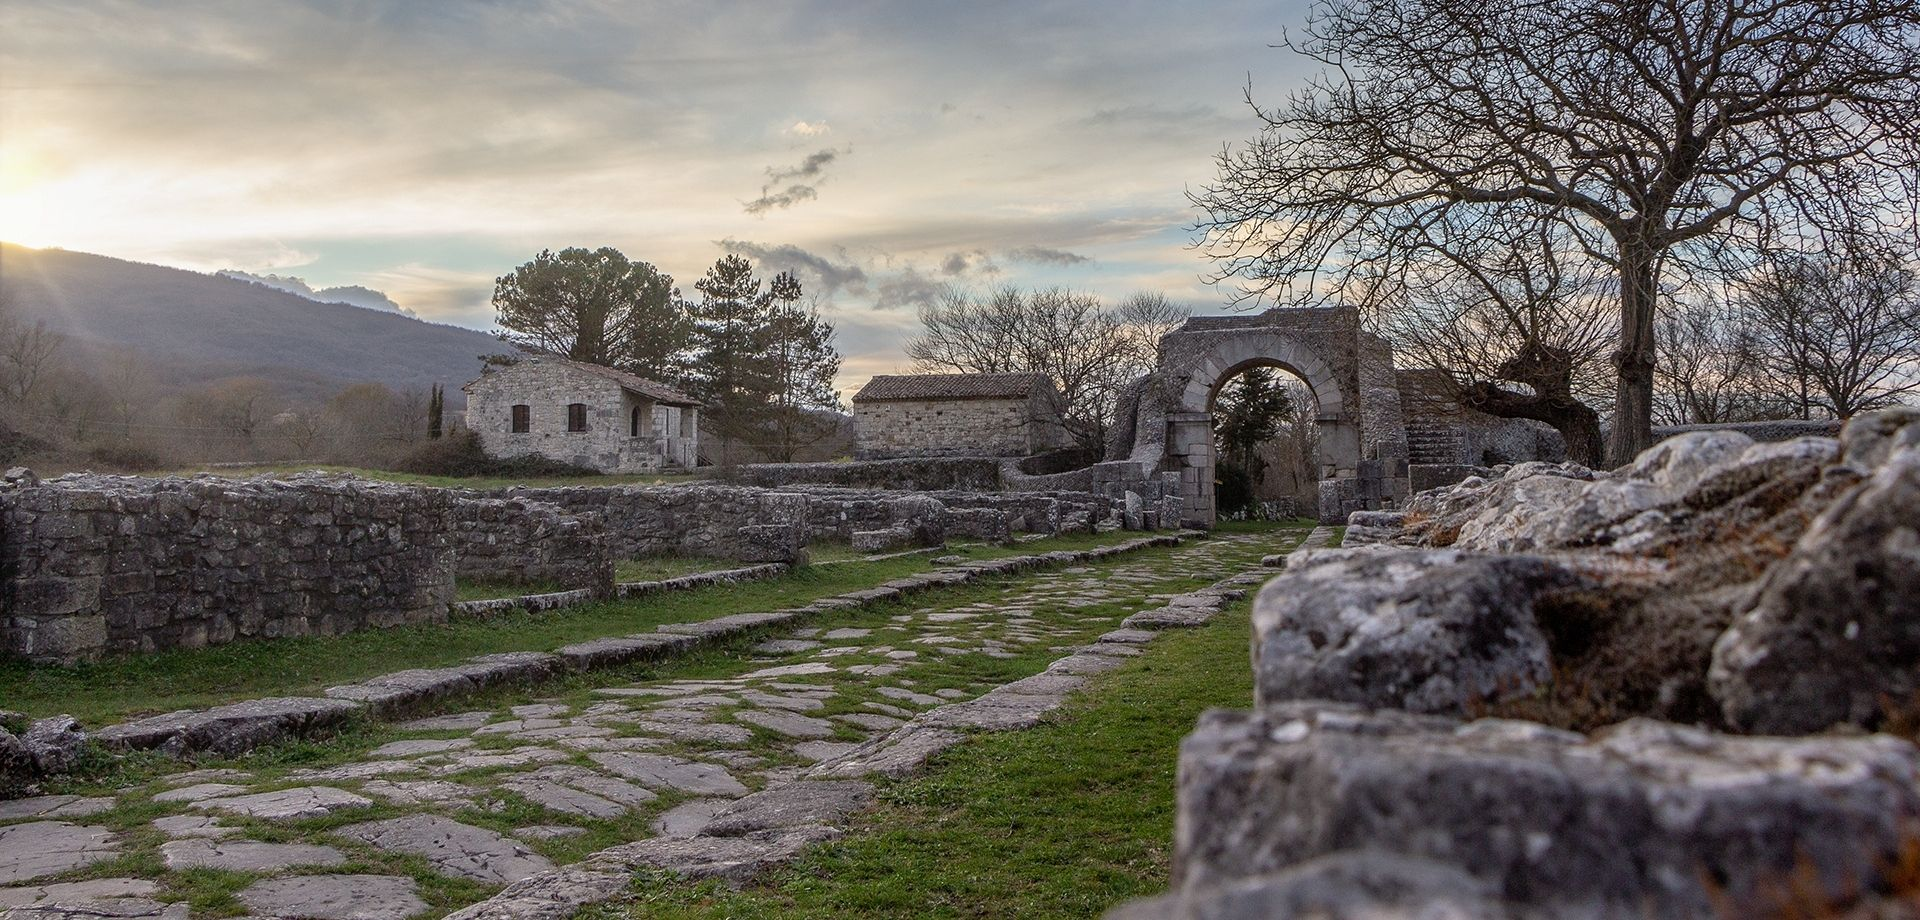 Borghi, archeologia e cashmere a Sepino